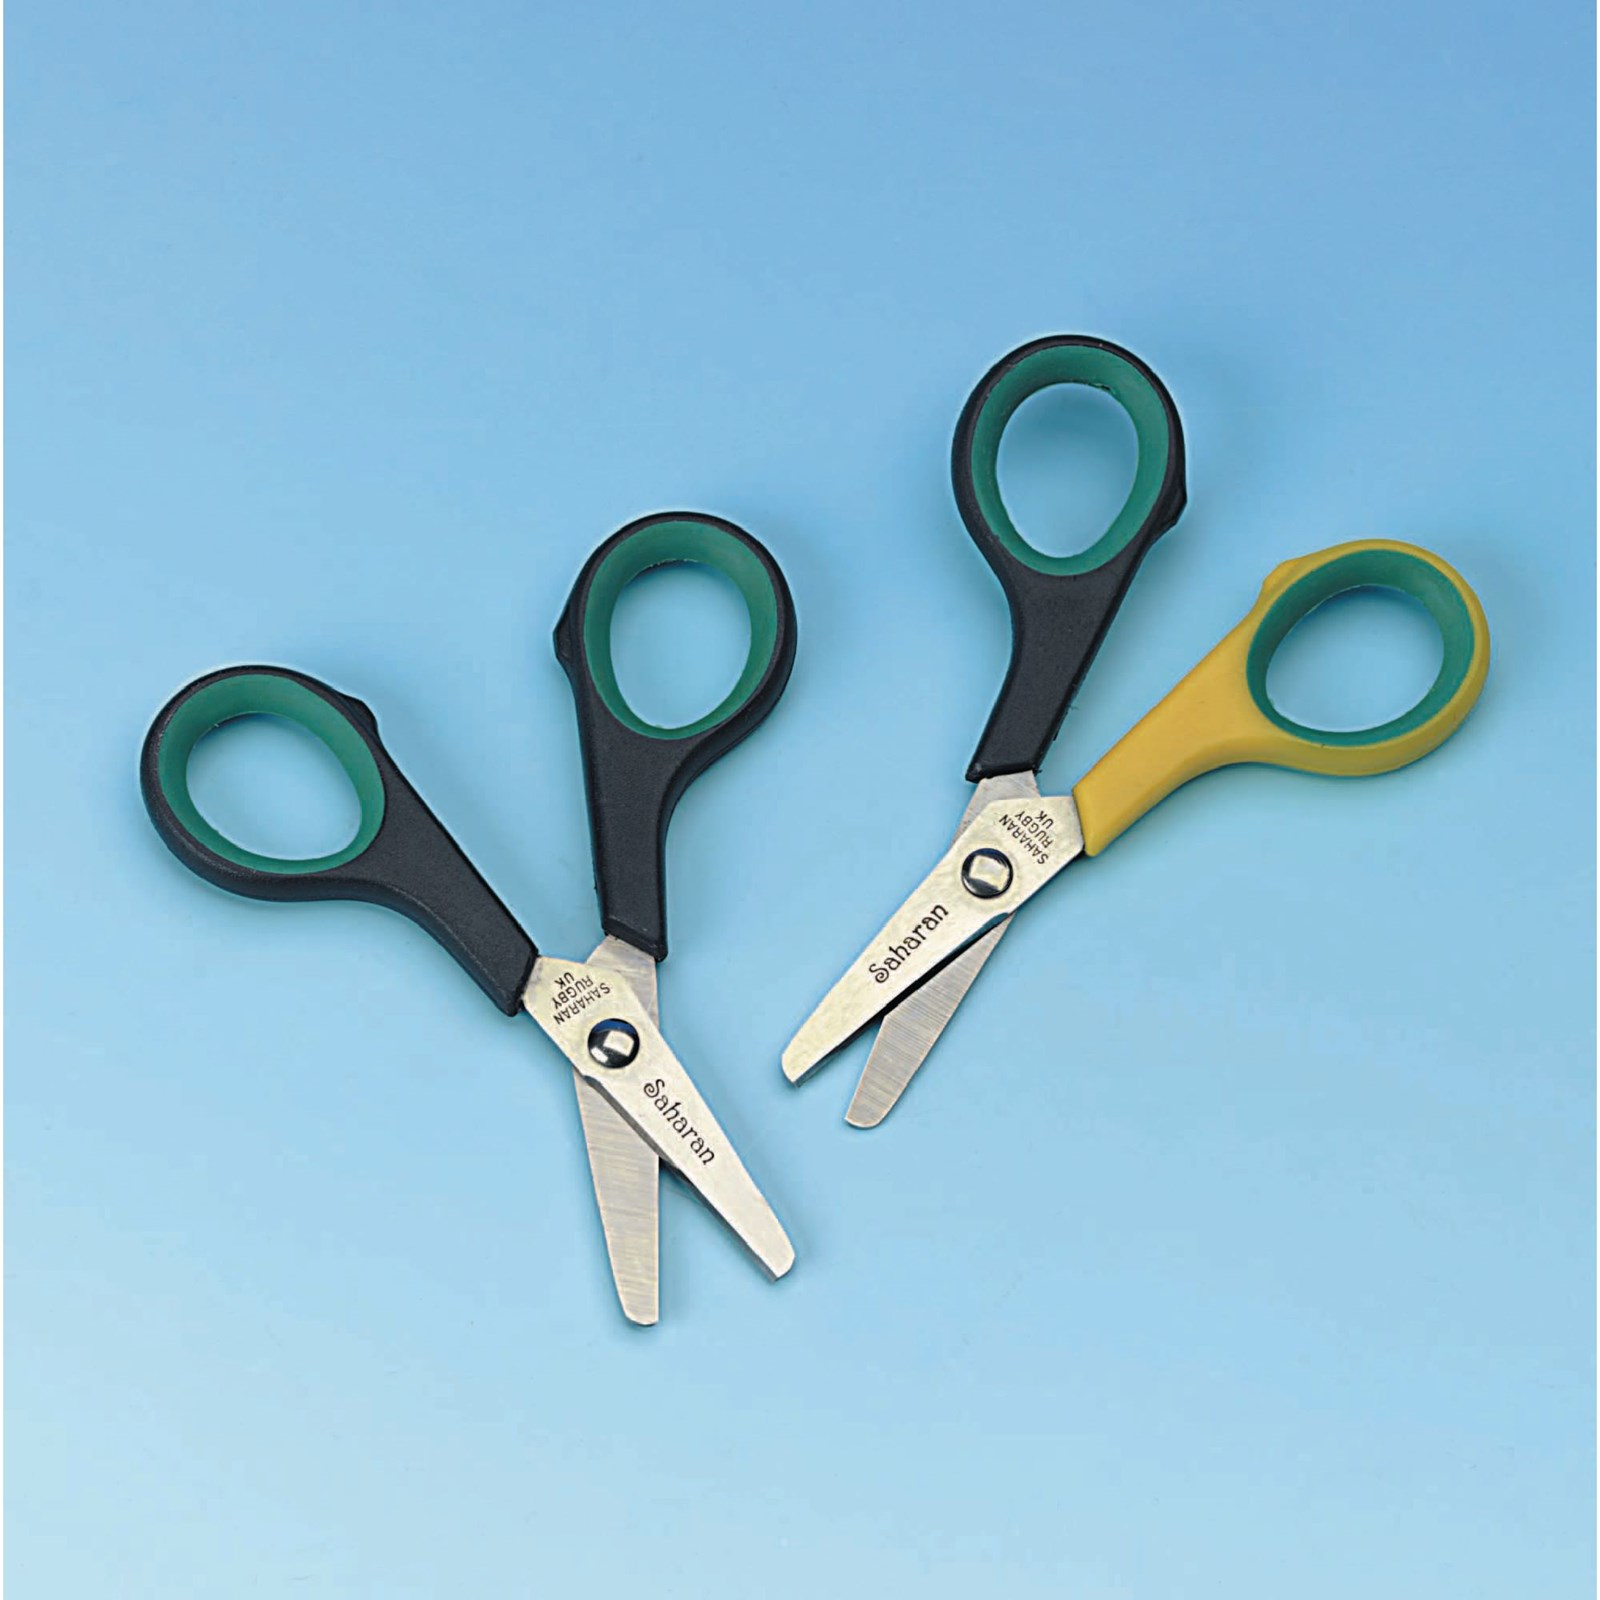 Soft Grip School Scissors - Left Handed - Pack of 12